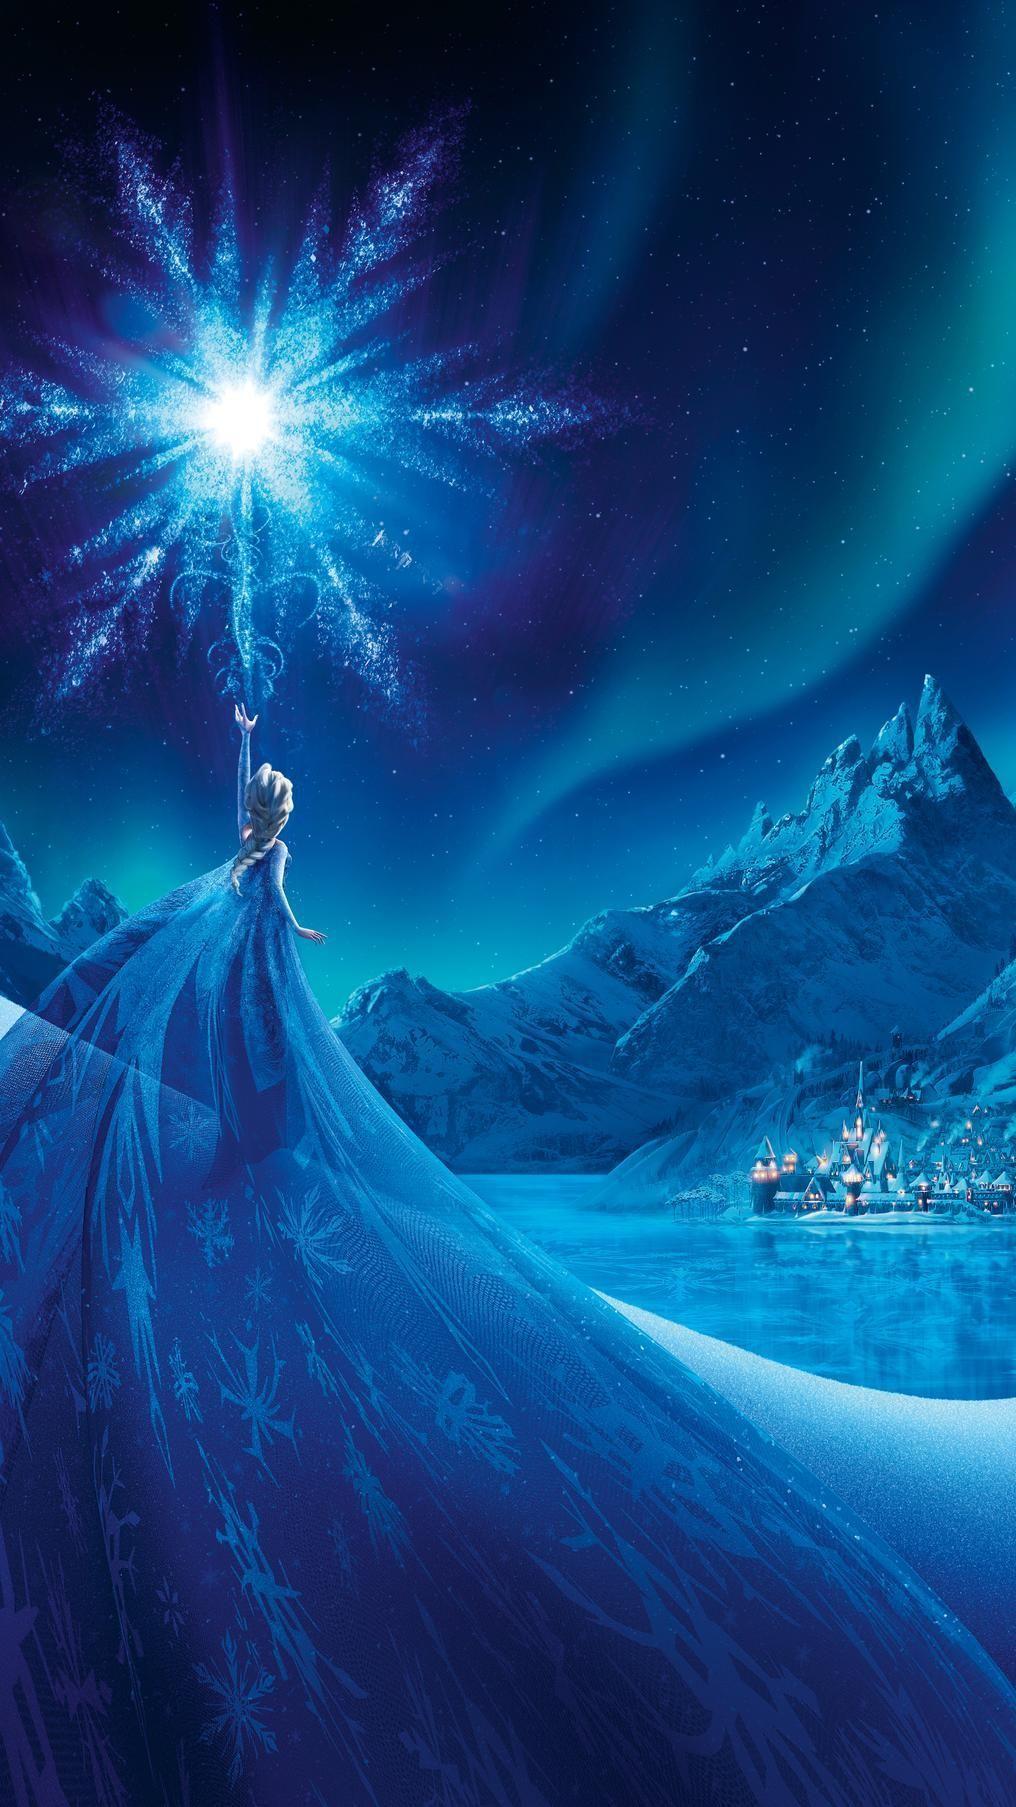 Frozen (2013) Phone Background Frozen (2013) Phone